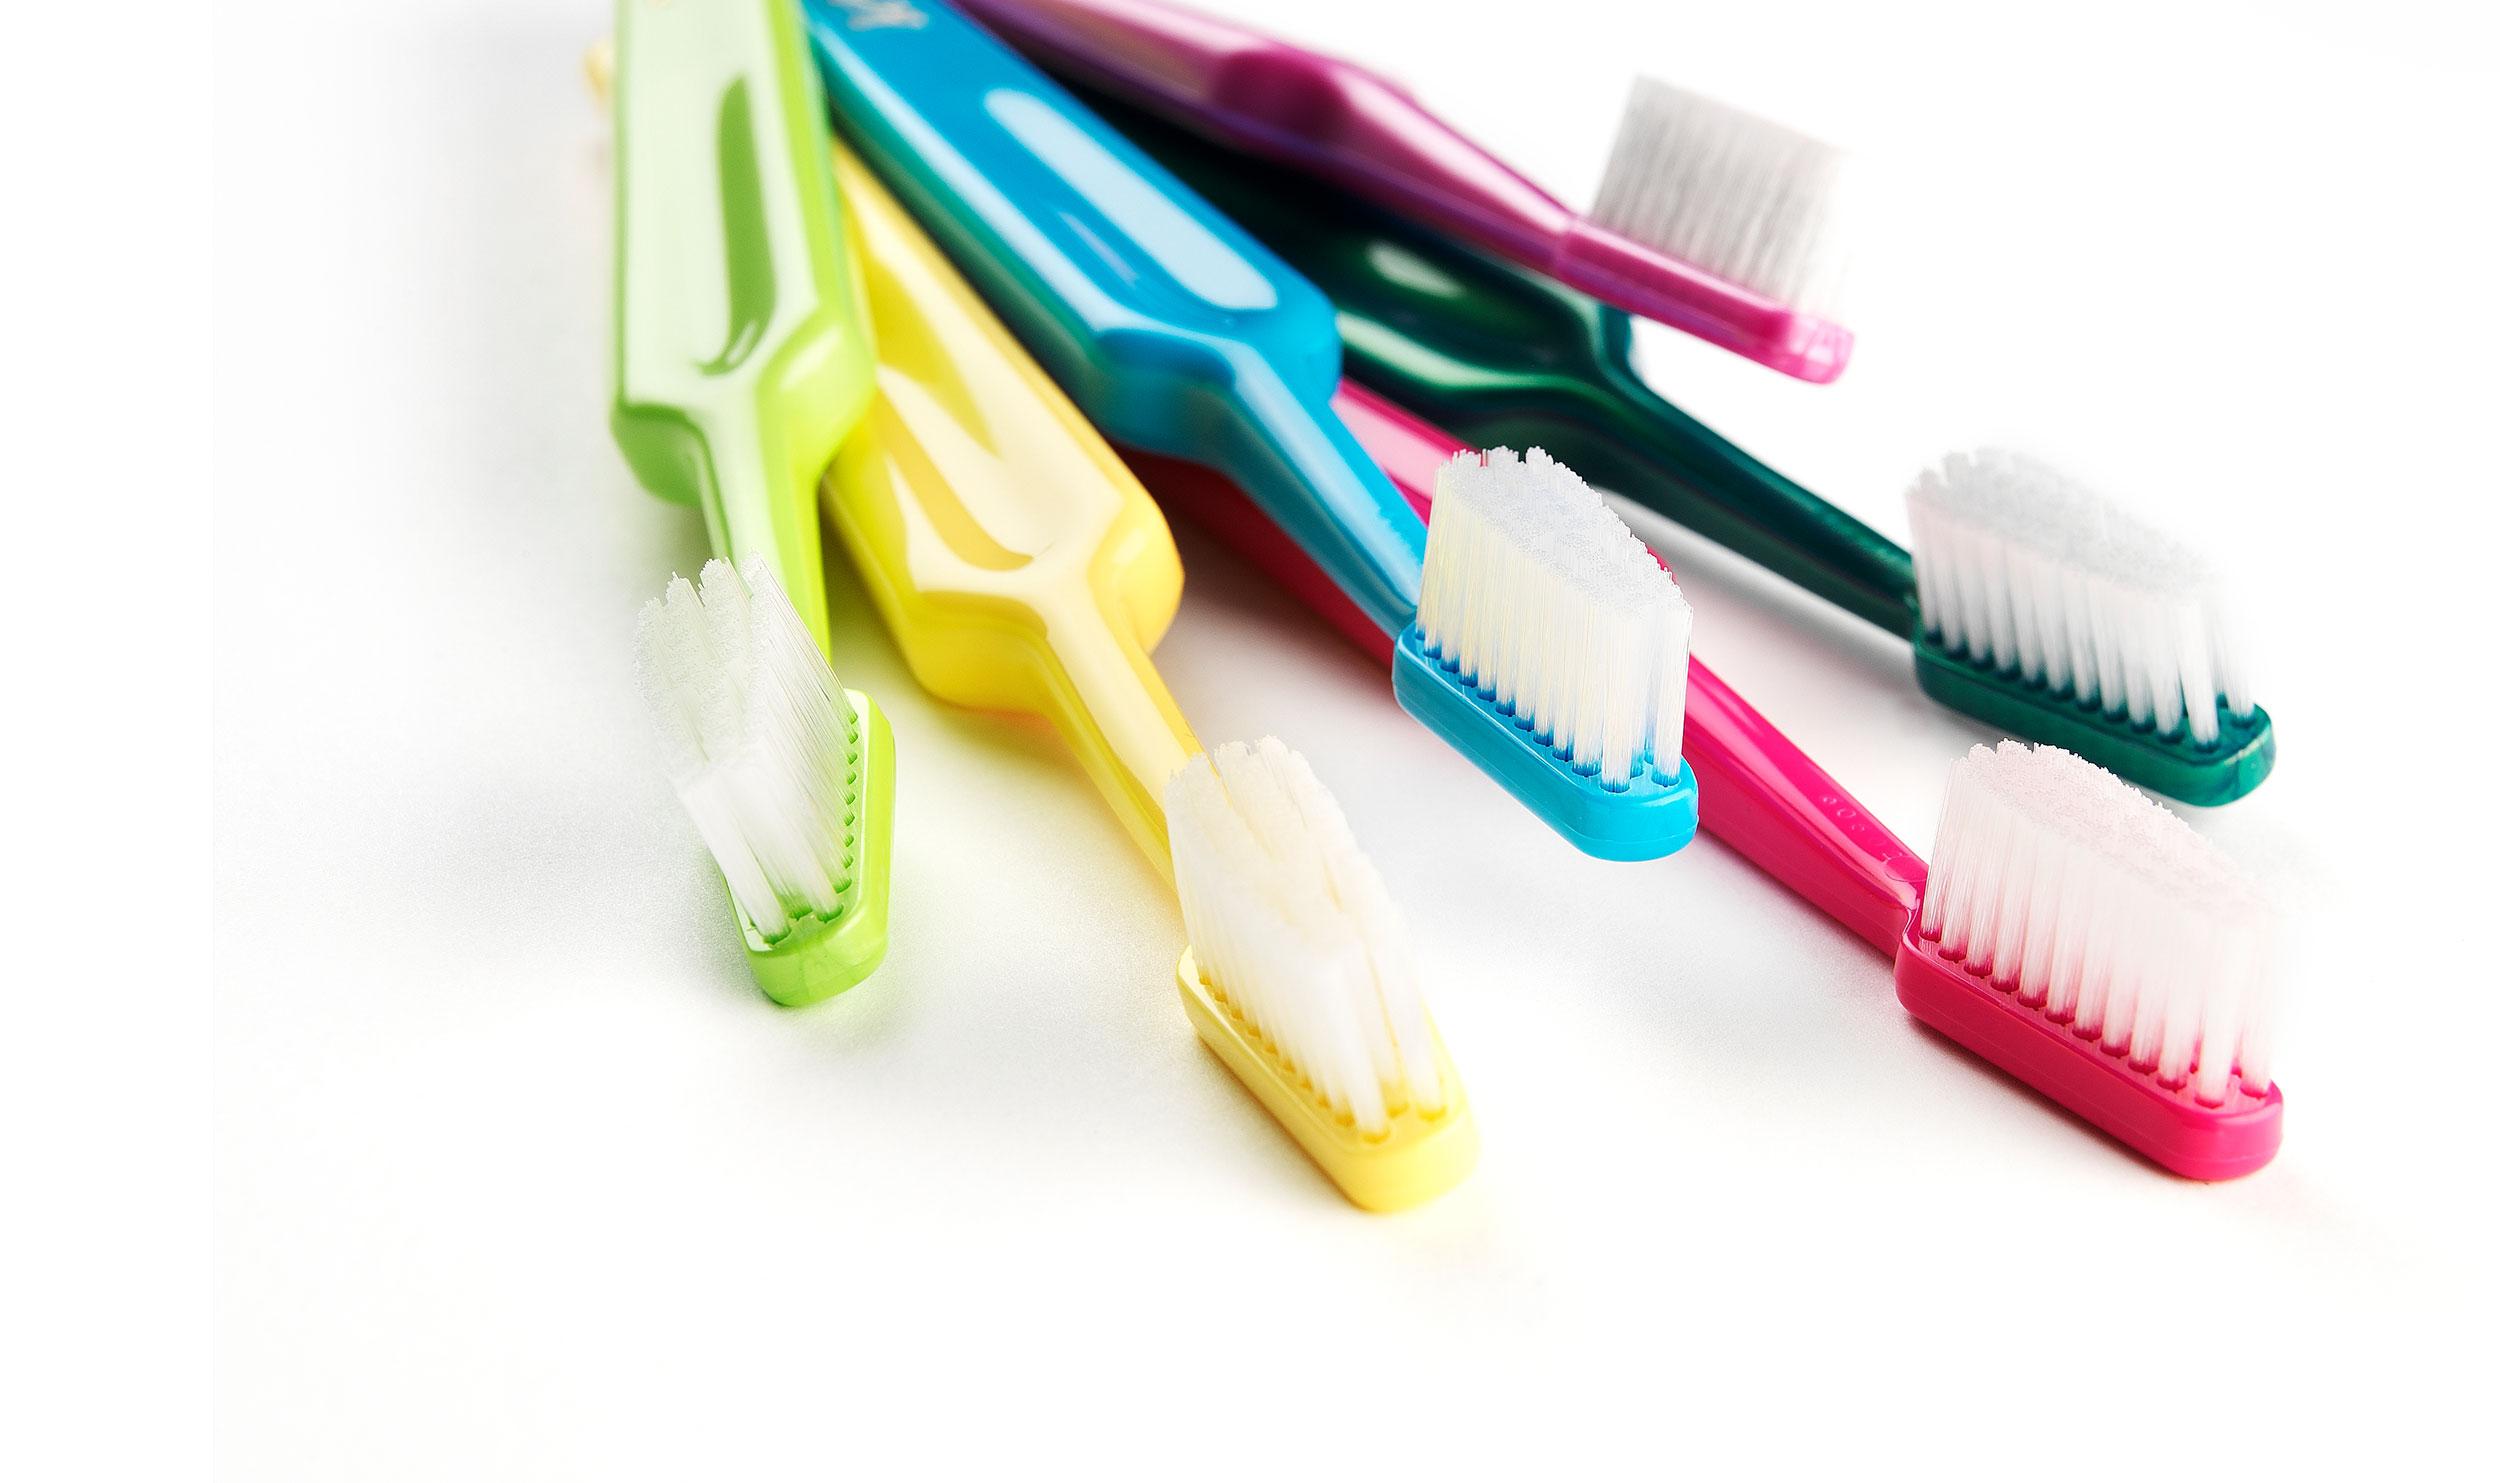 Eu e a escova a escova e eu - 3 part 5